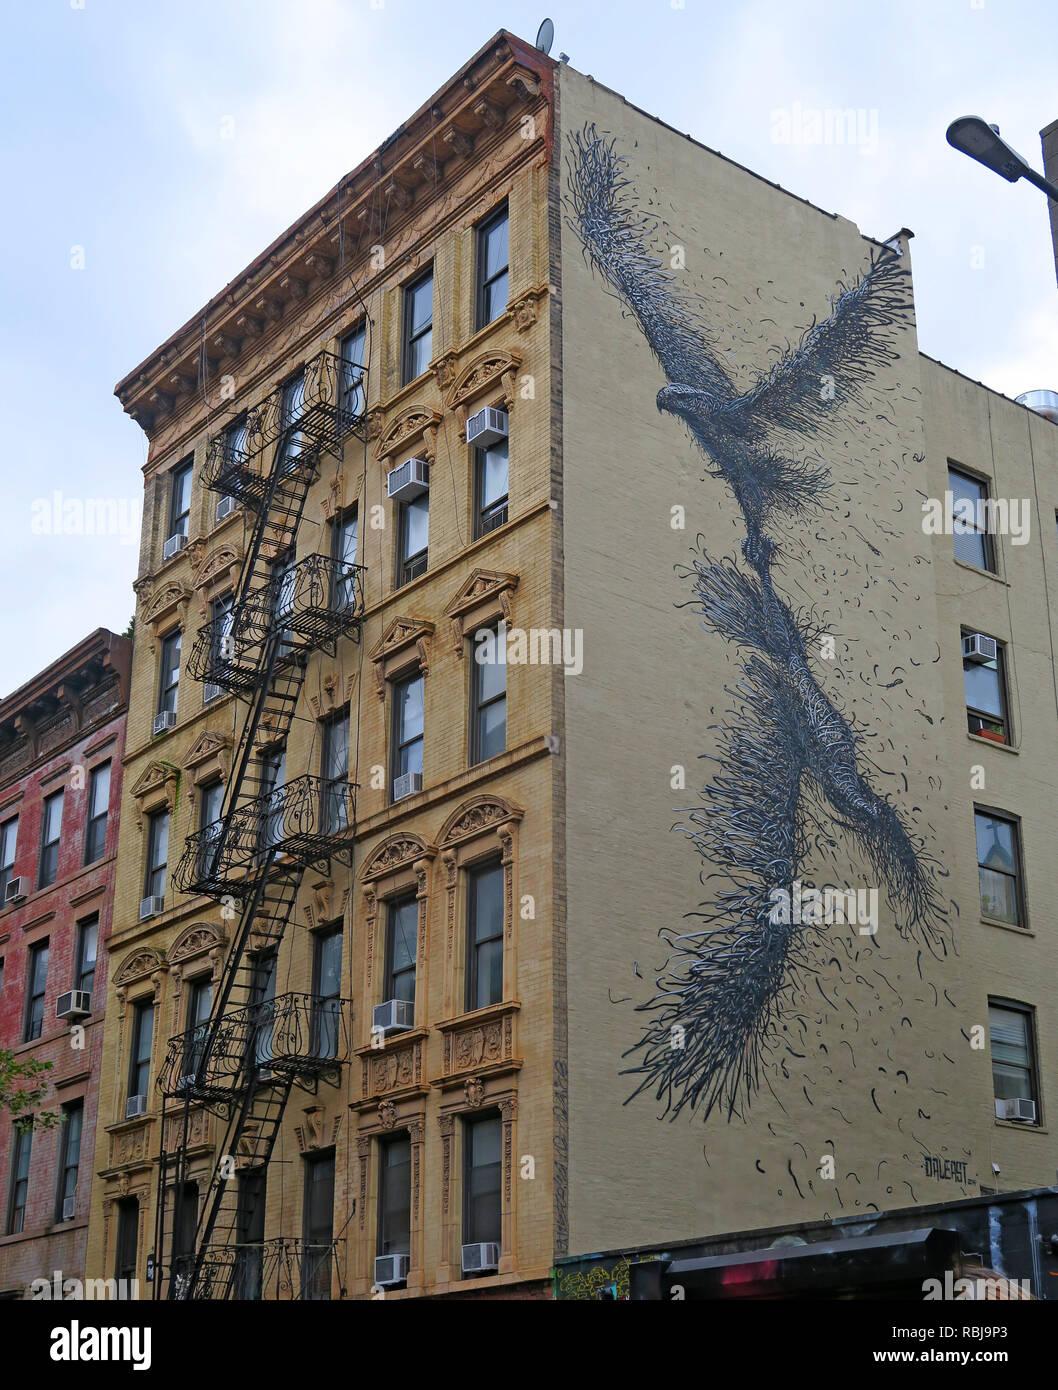 @HotpixUK,HotpixUK,GoTonySmith,NY,New York City,City,Centre,City Centre,street,USA,United states of America,United States,East Village,art,102,Art,Street Art,painting,gableend,gable end,Proletariat,102 St Marks Place,East Village New York,NYC